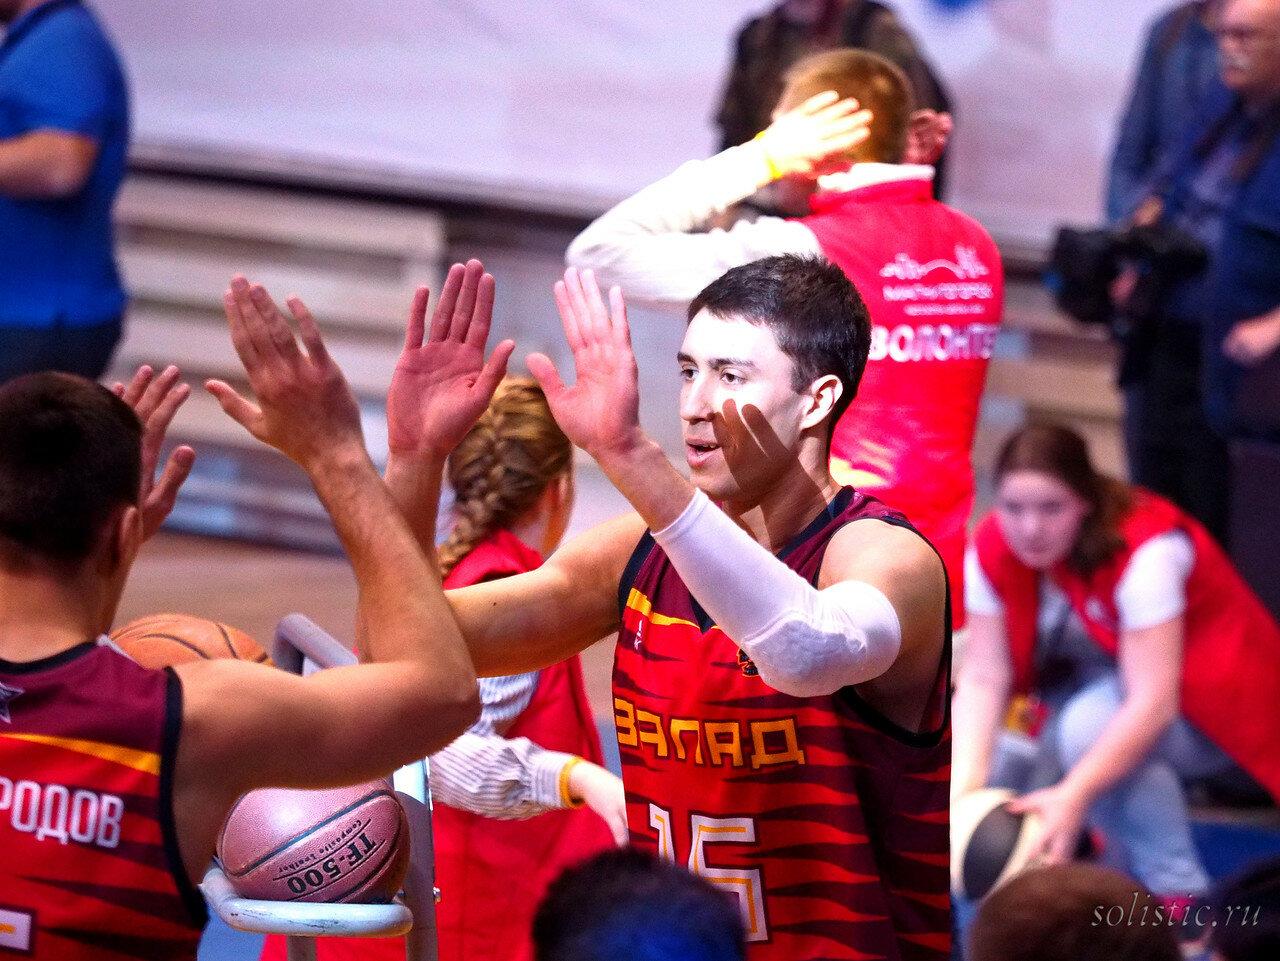 96 Матч звезд АСБ 2018 (ассоциации студенческого баскетбола)